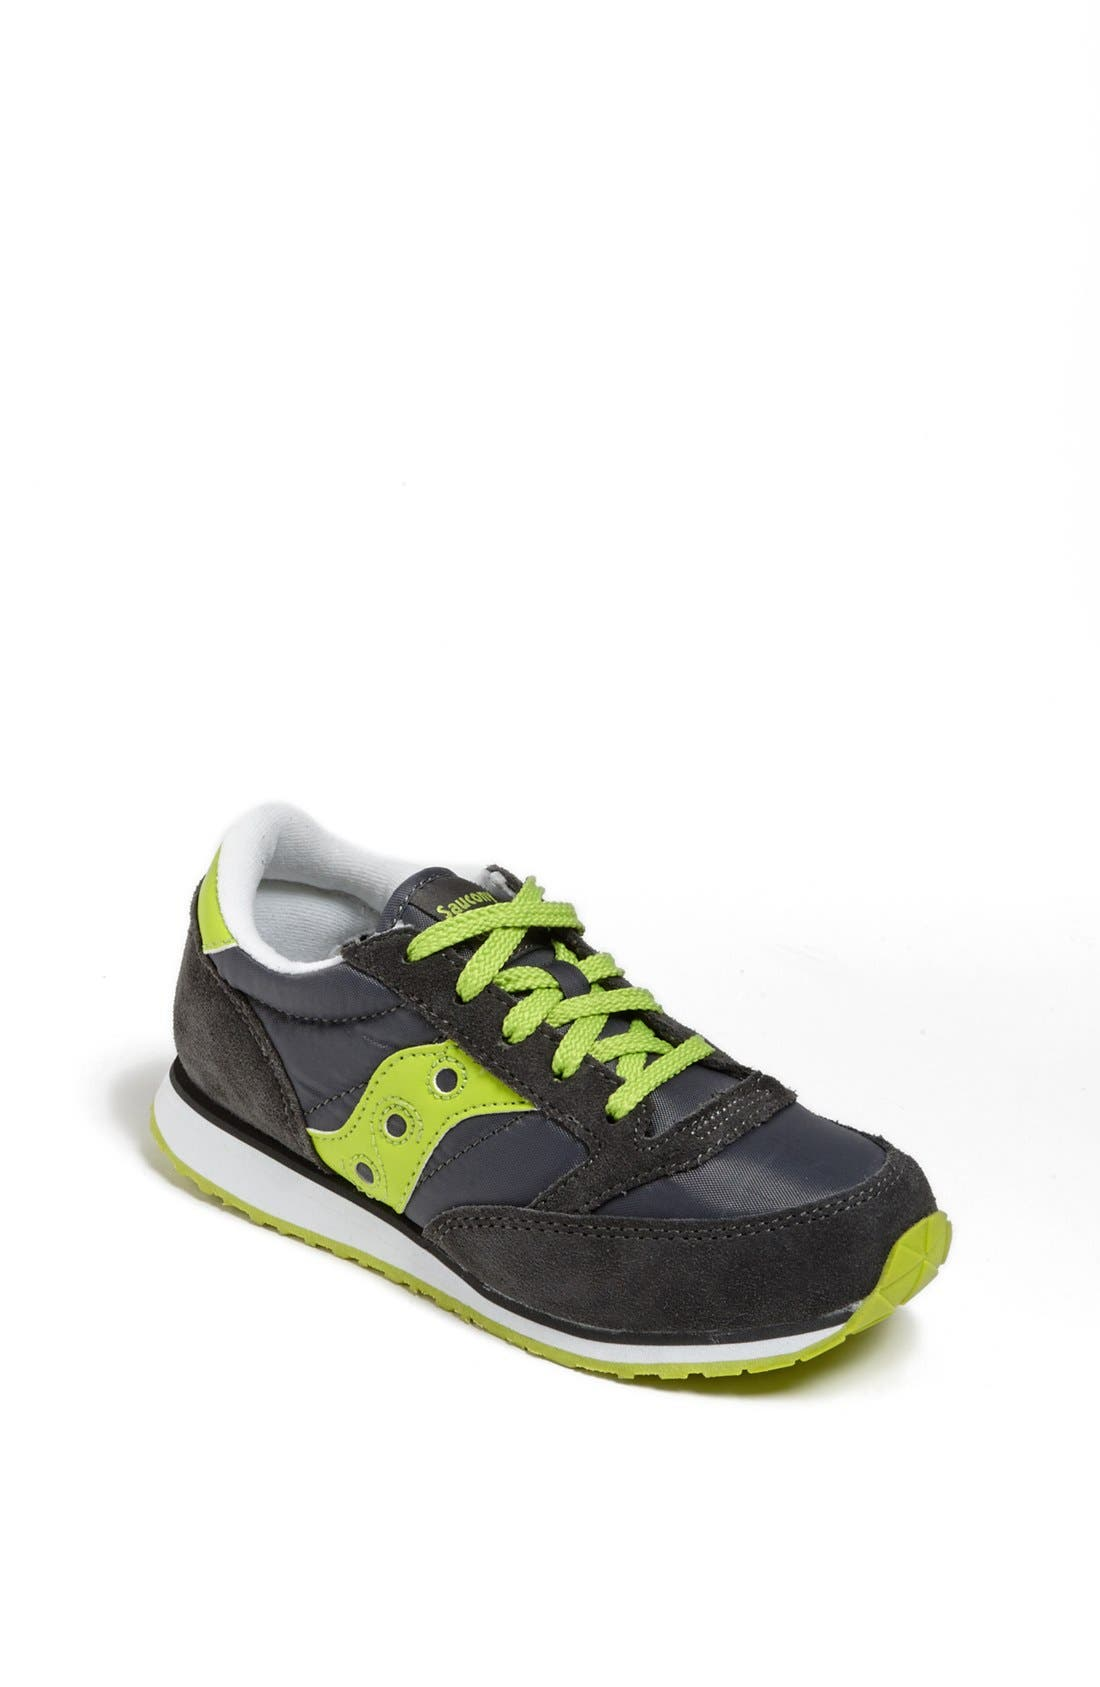 Main Image - Saucony 'Jazz - LowPro' Sneaker (Toddler & Little Kid)